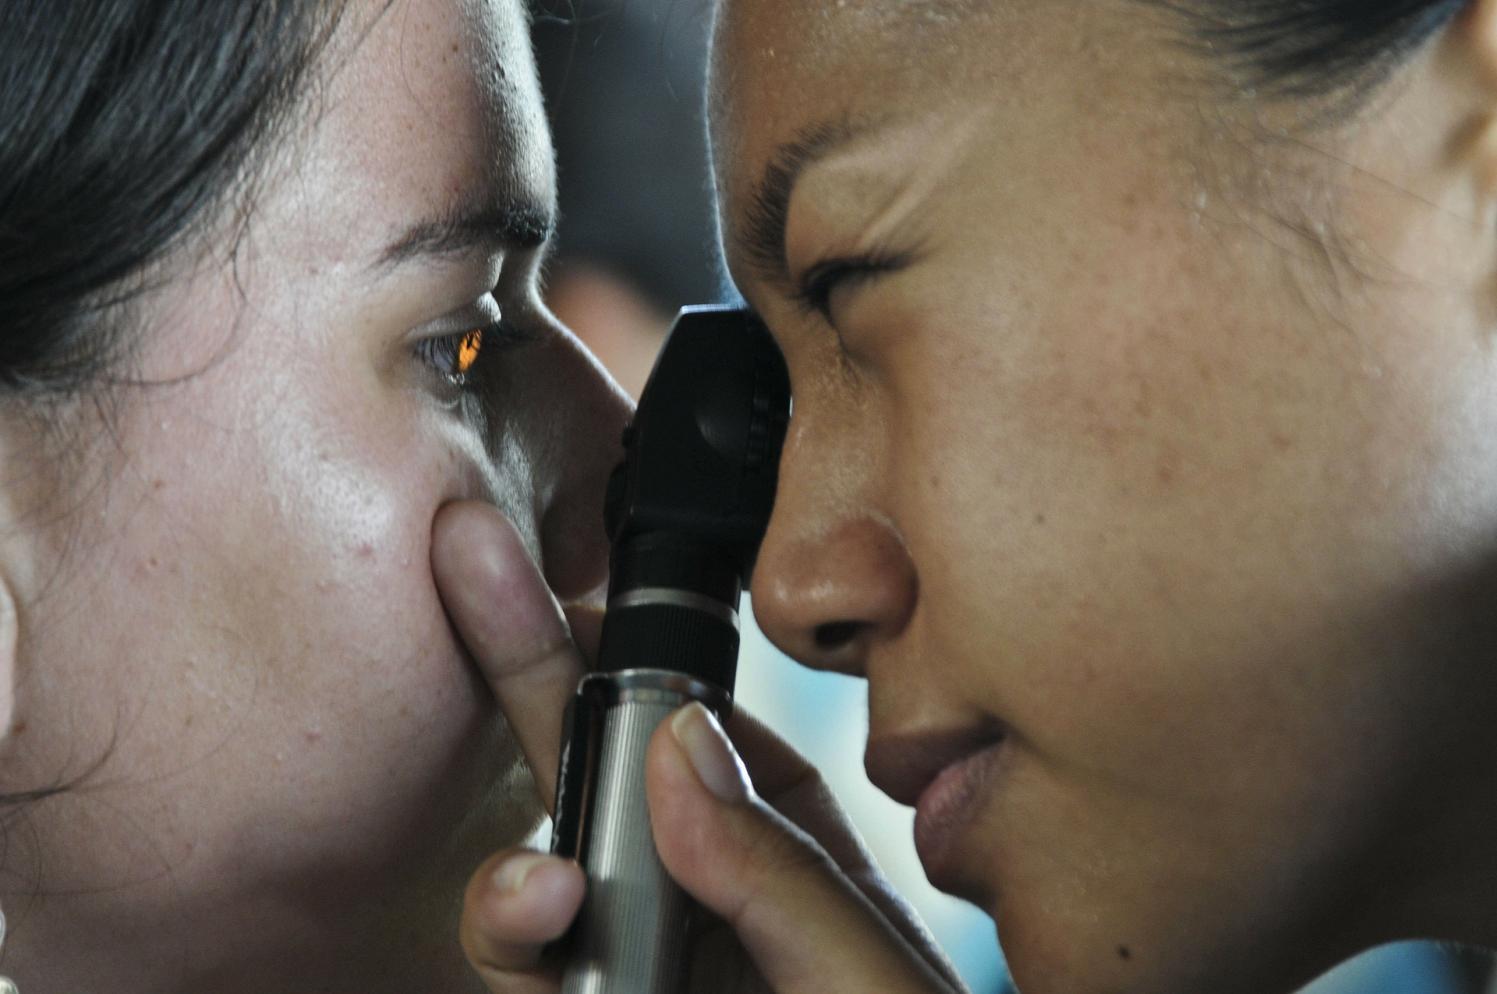 Consultório de oftalmologia de Cordeirópolis passará por reformas